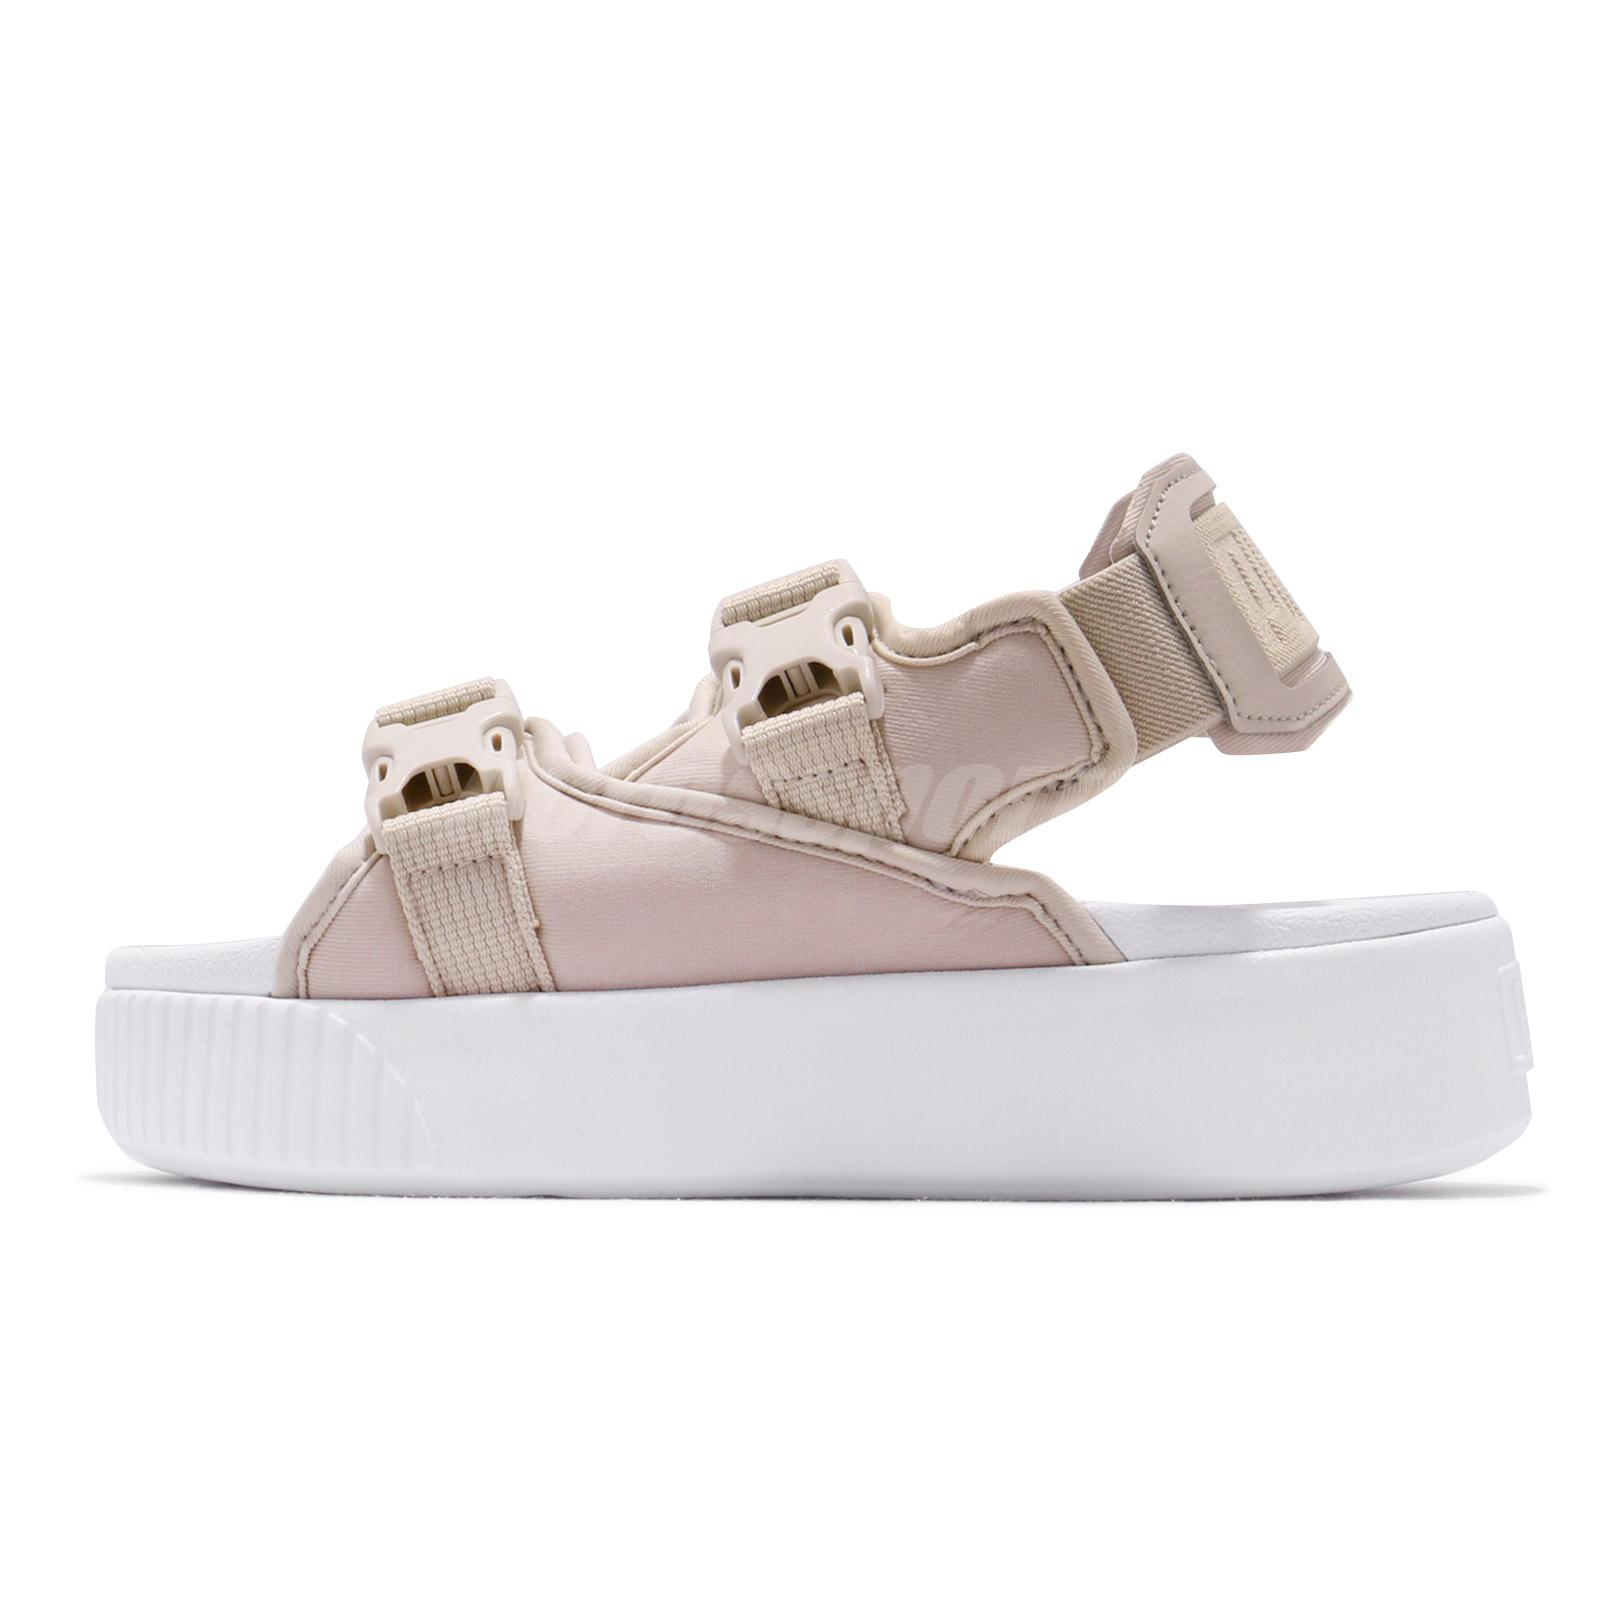 puma women's platform slide ylm sandal